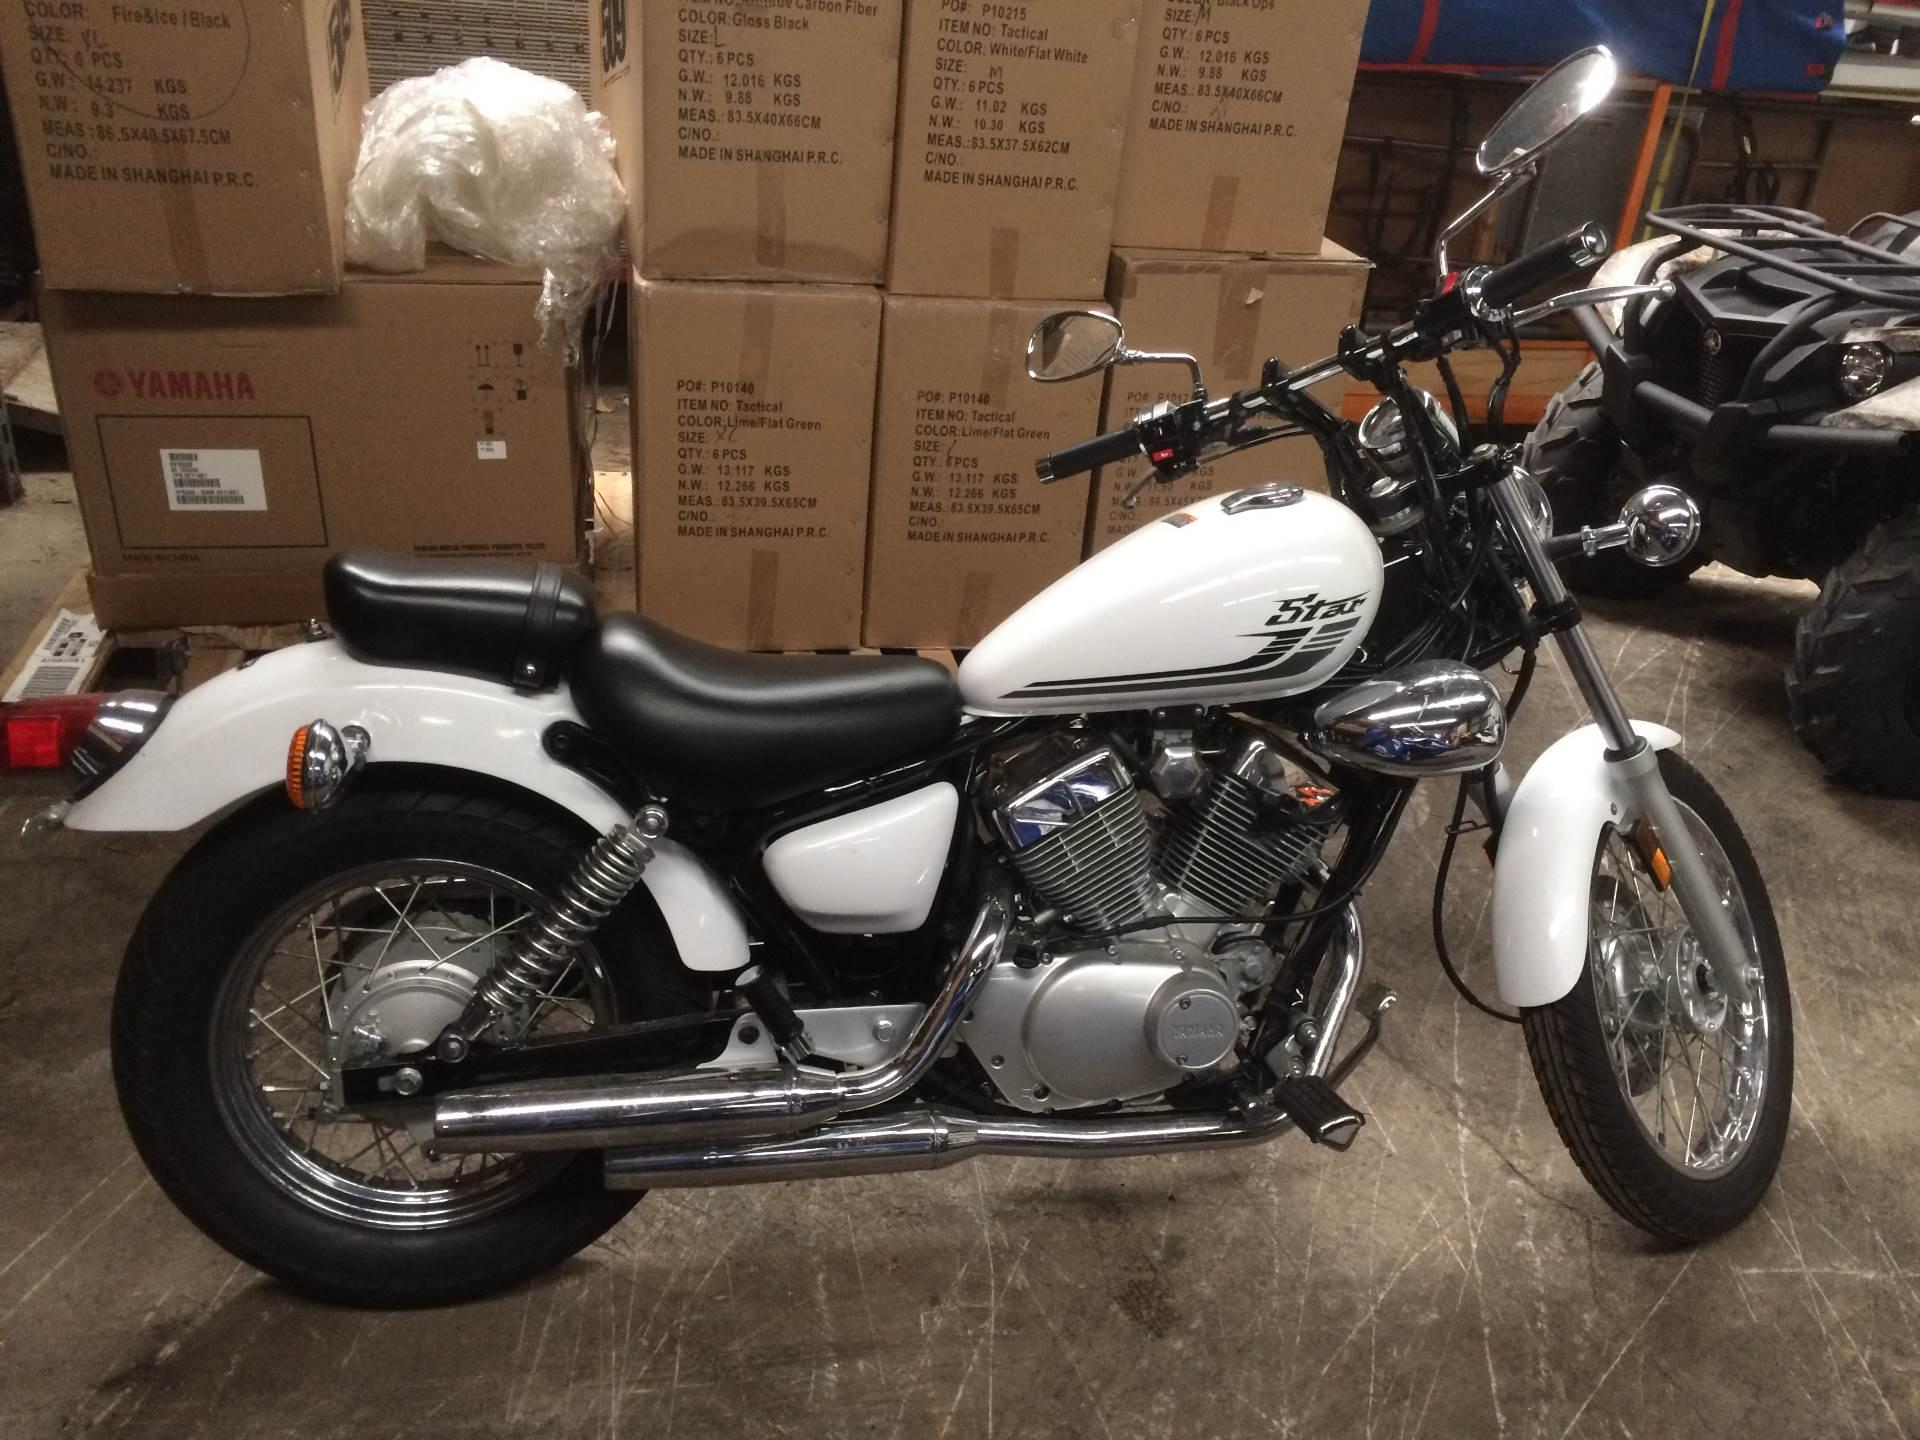 New 2016 Yamaha V Star 250 Motorcycles in Port Washington, WI ...